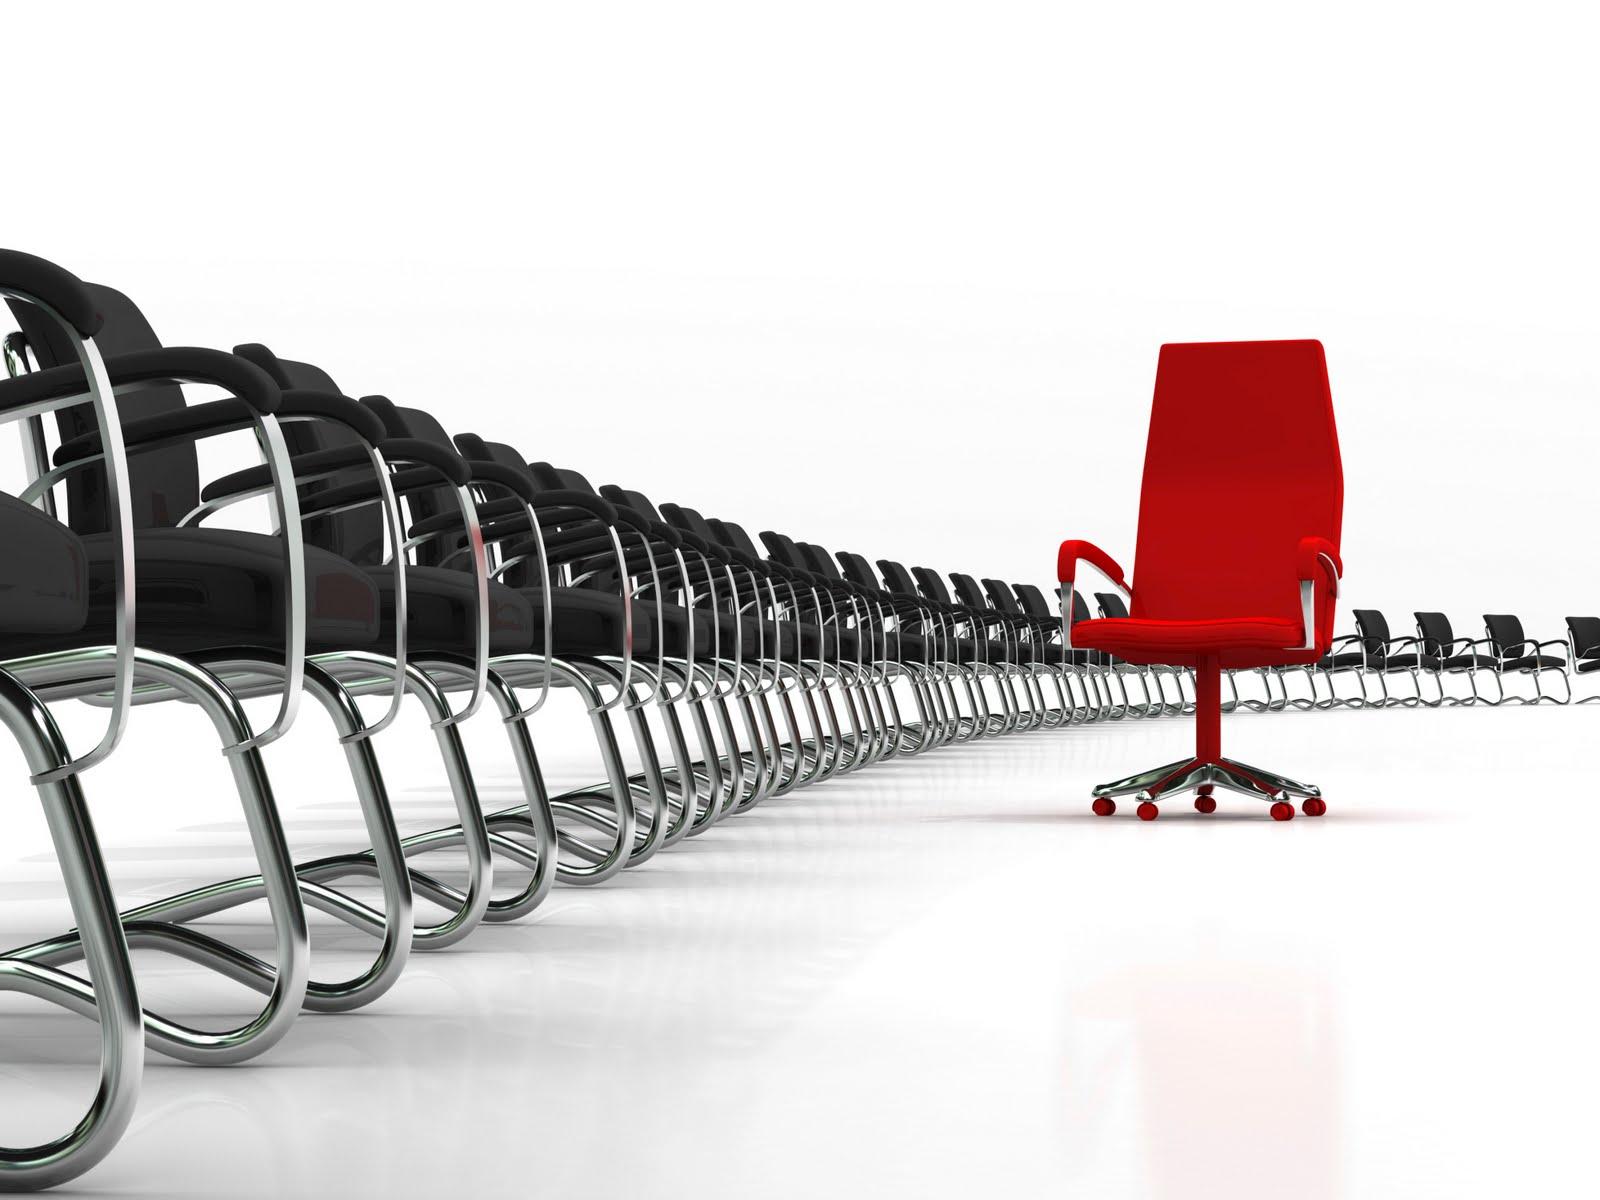 Hukum Kepemimpinan, Hikmah Serta Penjelasan Dari Maksud Kepemimpinan